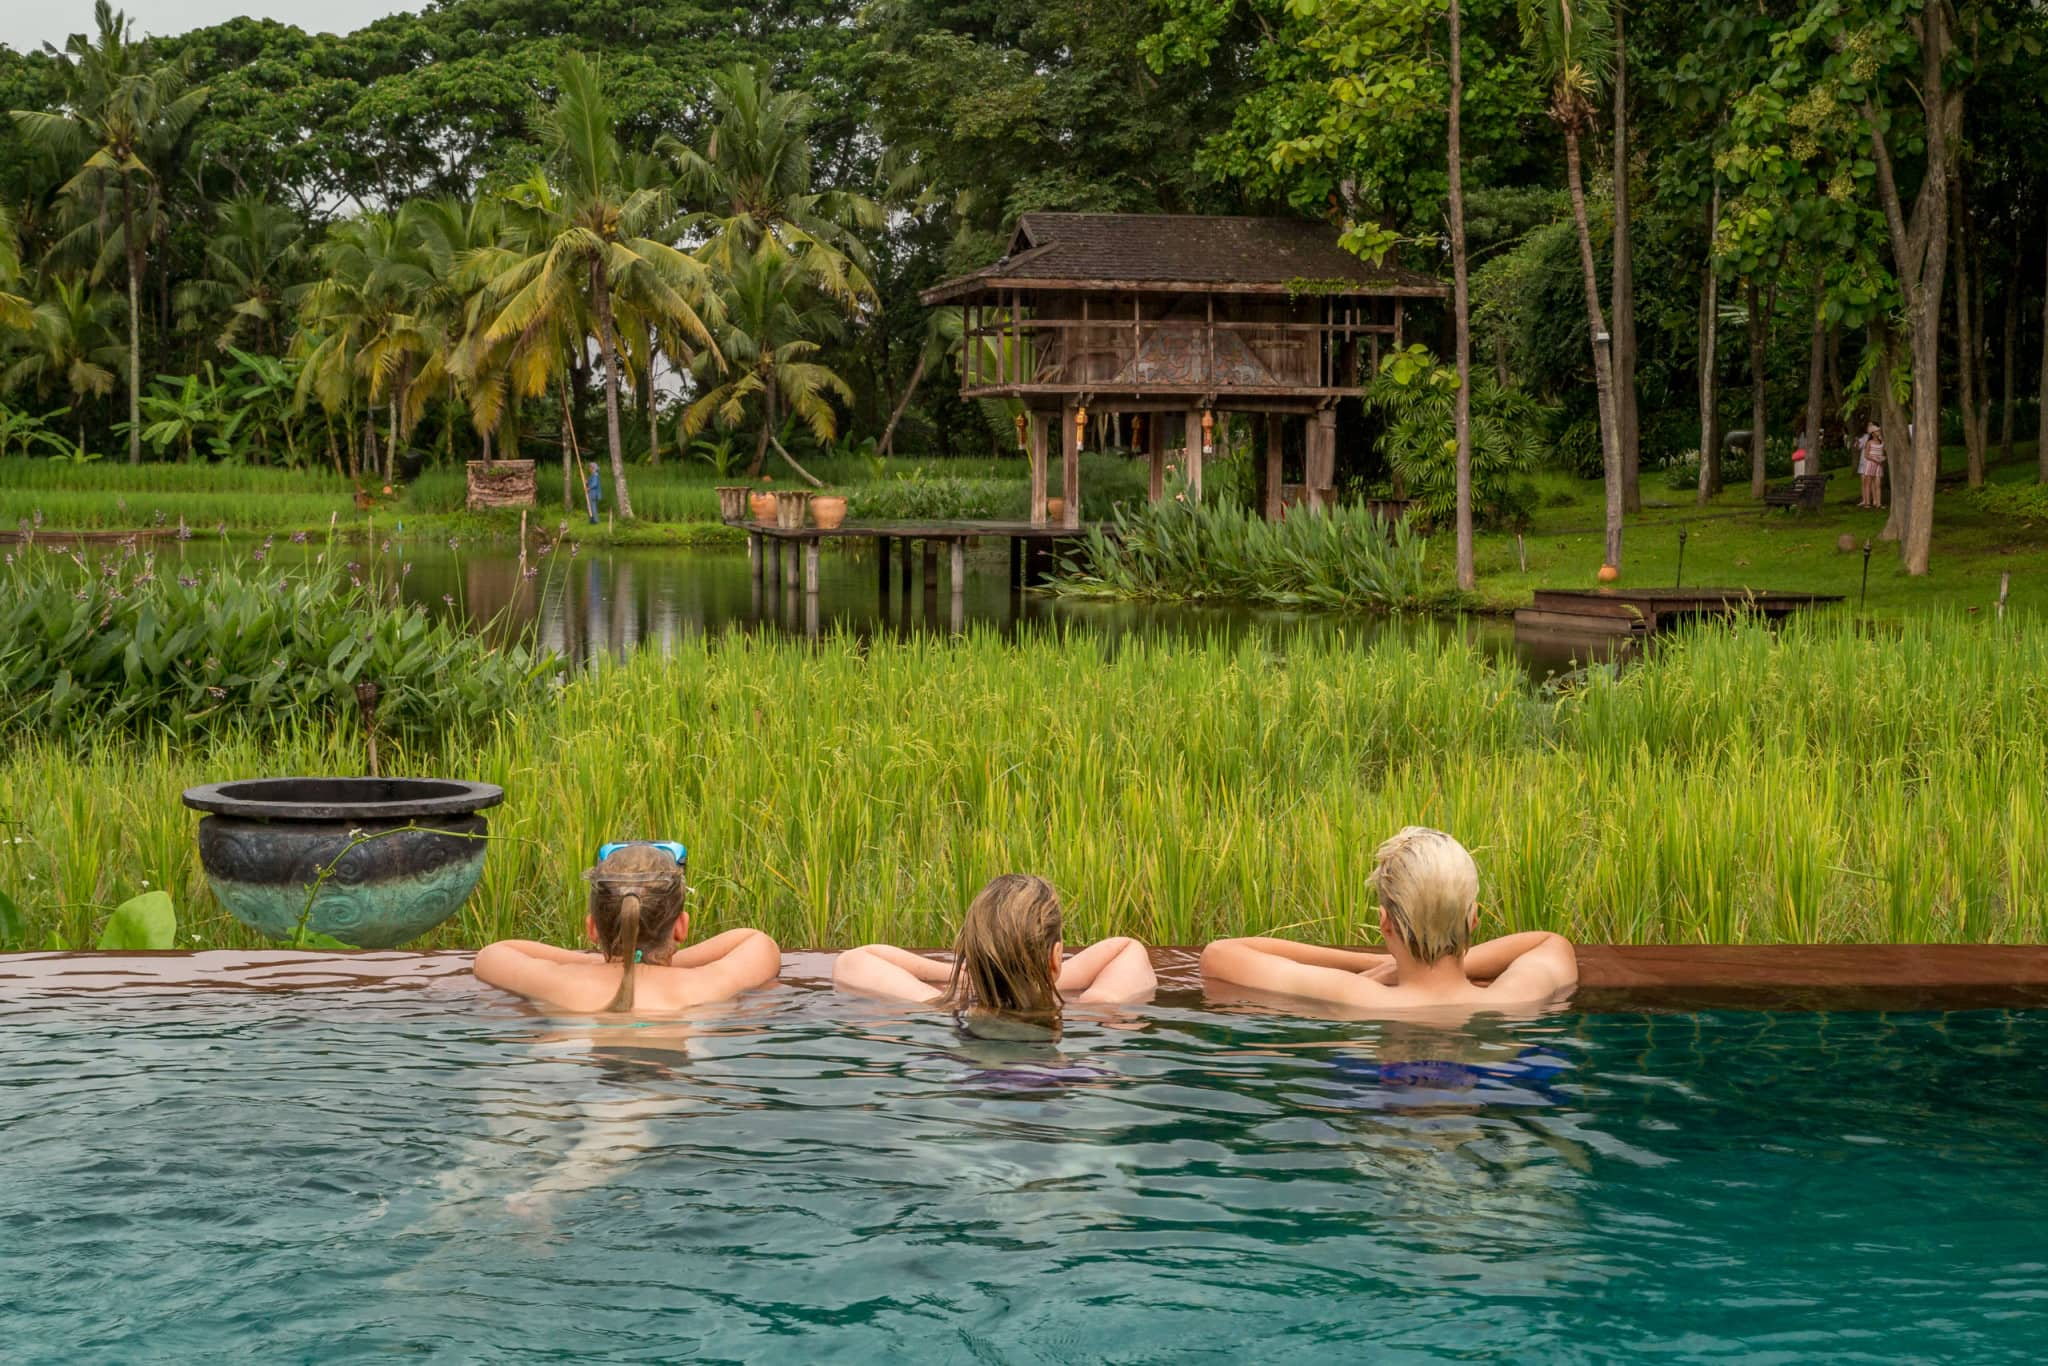 Enjoying the pool view - THAILAND - Four Seasons Chiang Mai: A luxury treasure in the Mae Rim Valley